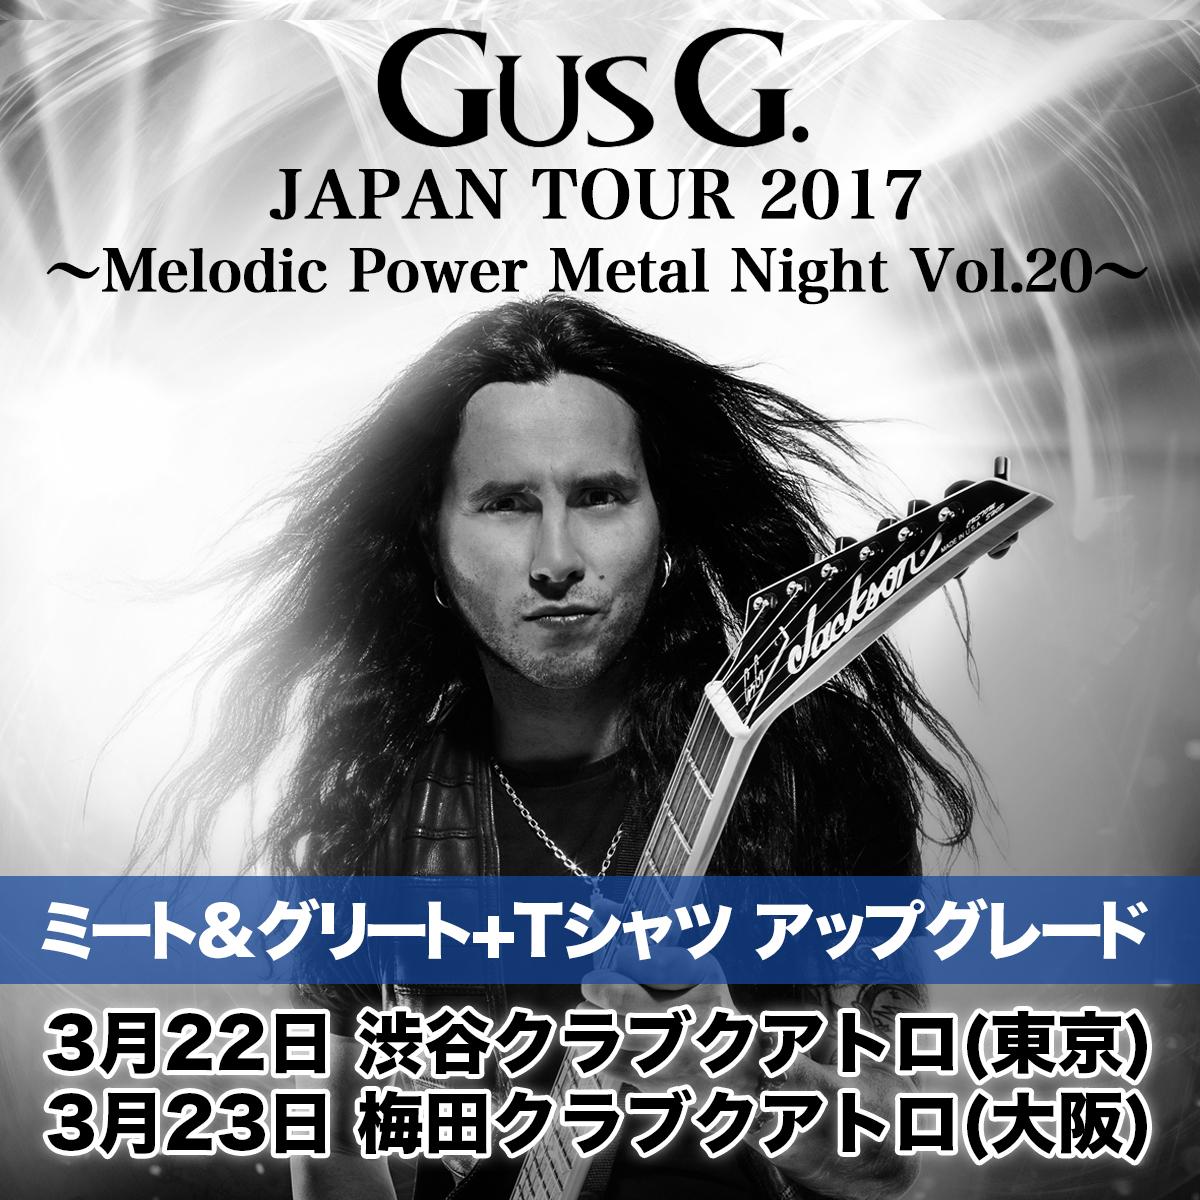 gusg-up